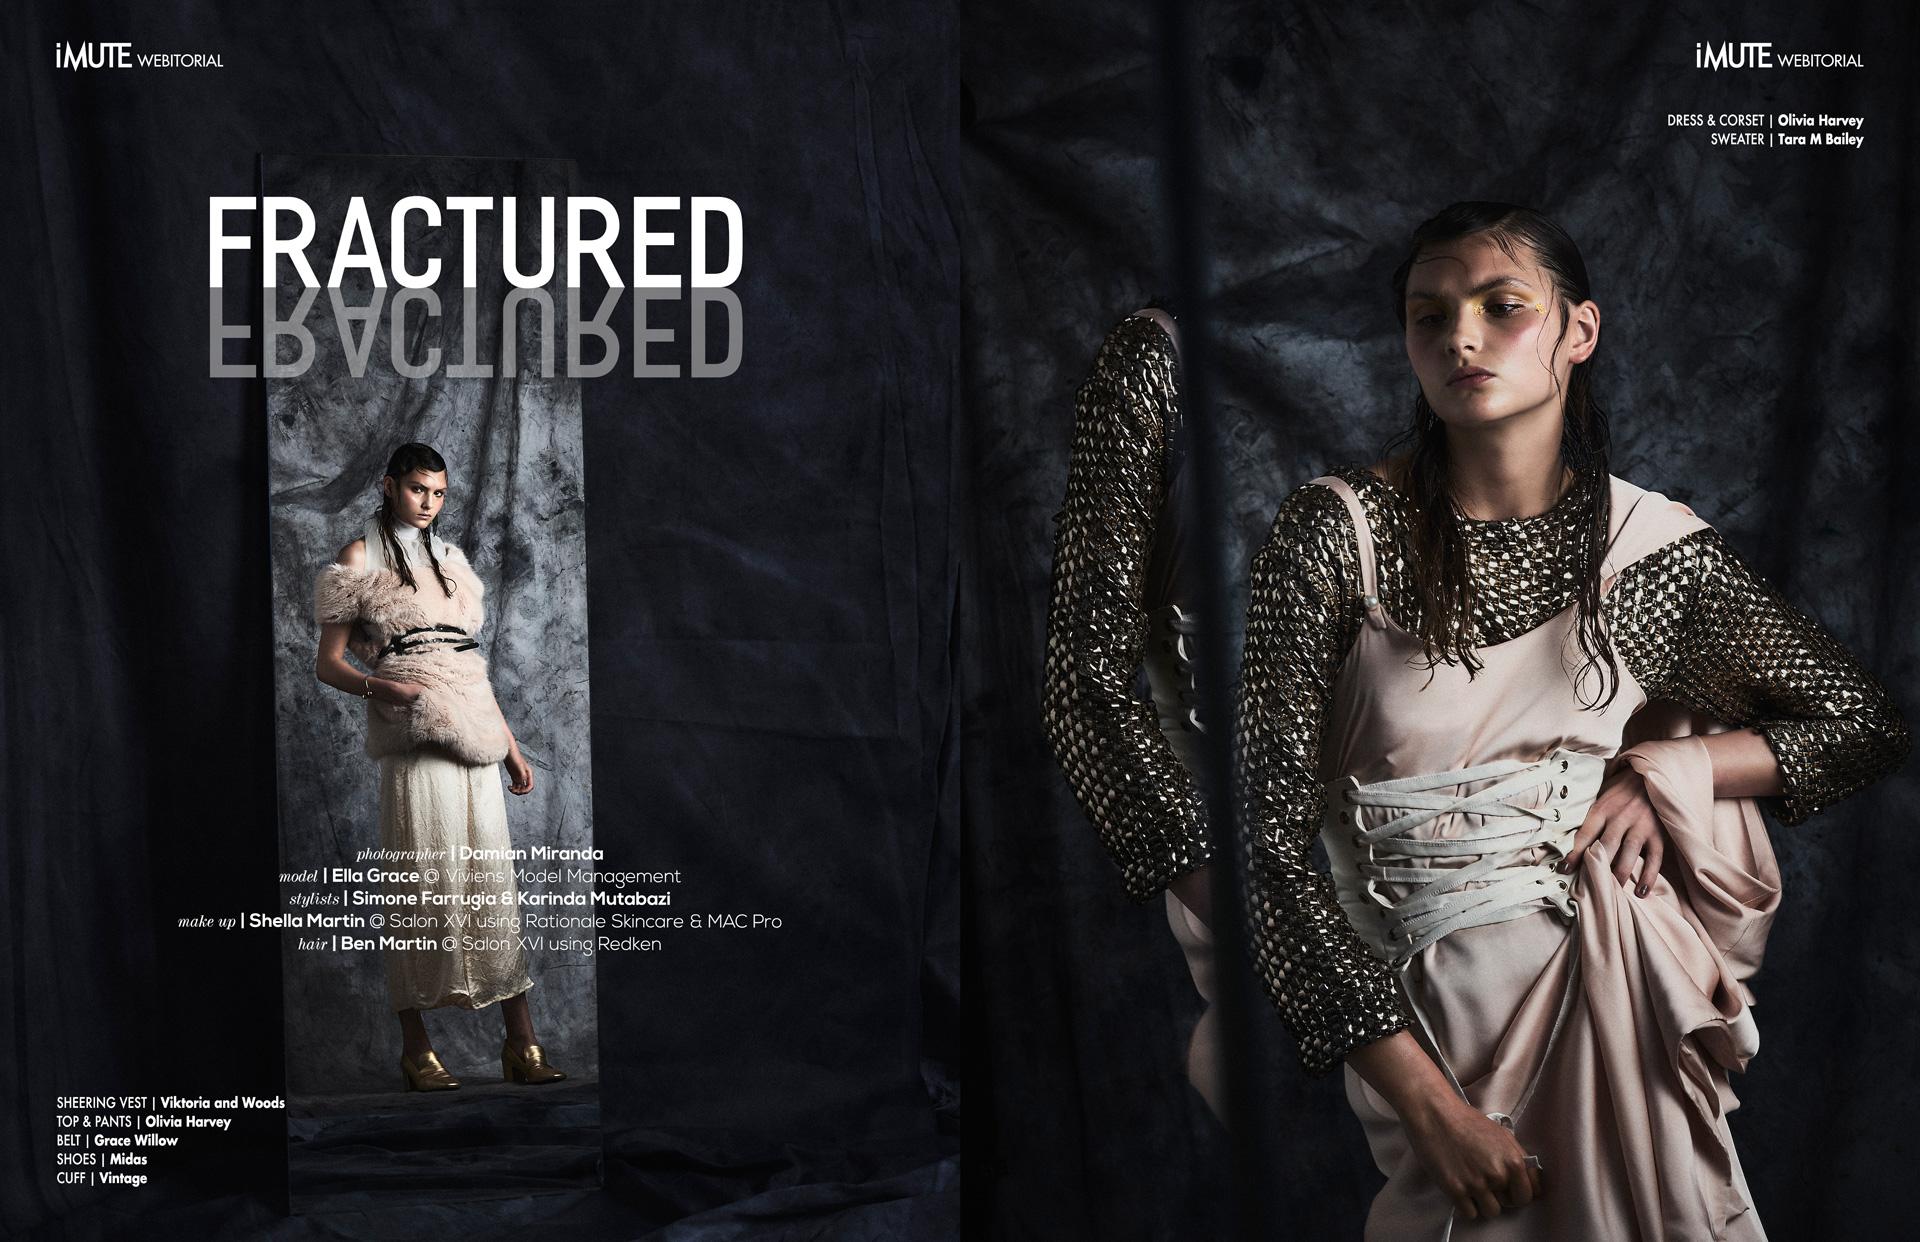 IMUTE Magazine - Fractured